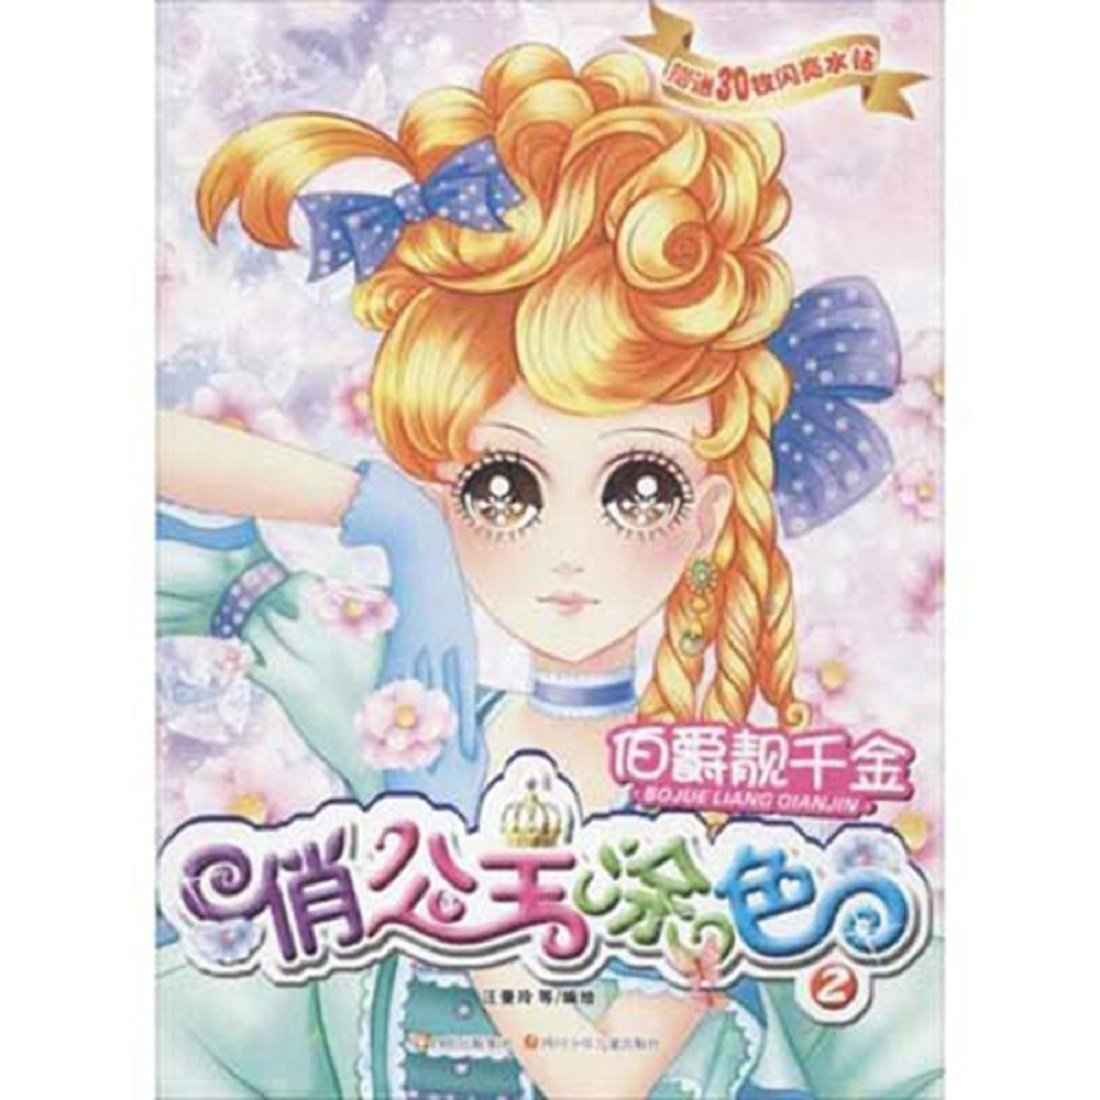 Pretty Princess For Children Grown Ups Grownups Printable Prints Digital Copy